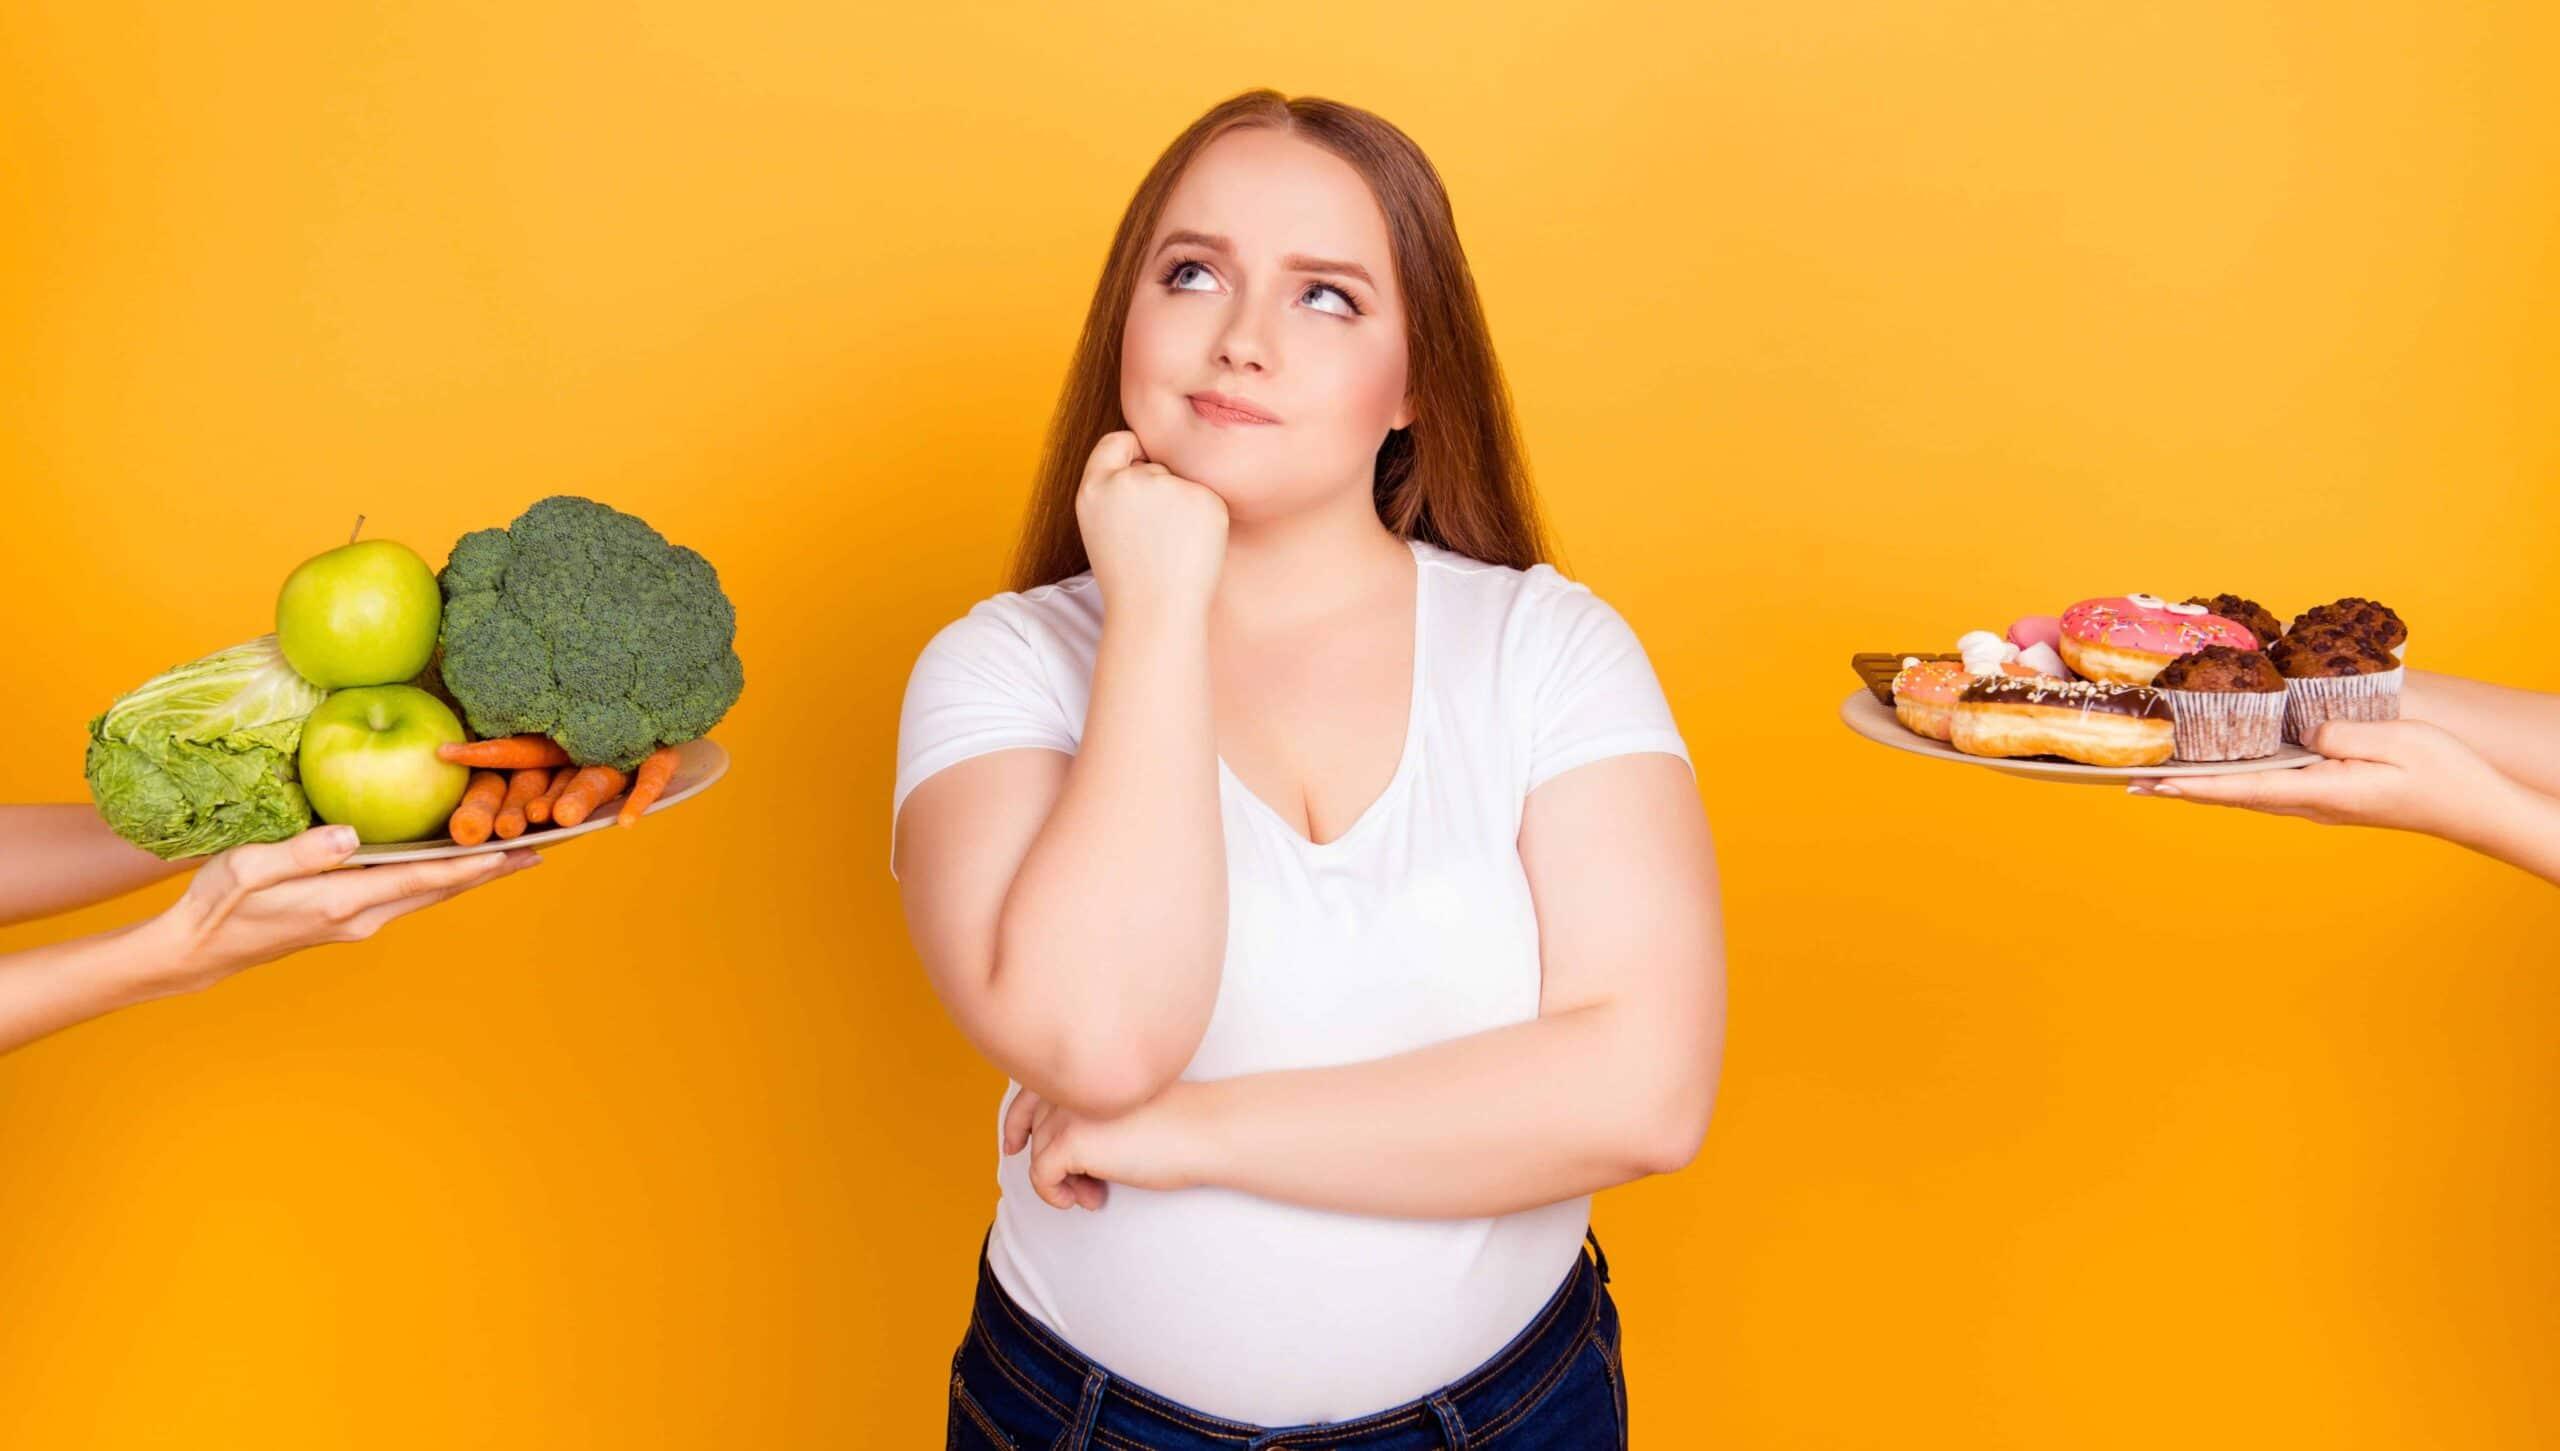 dieta a punti come funziona esempi